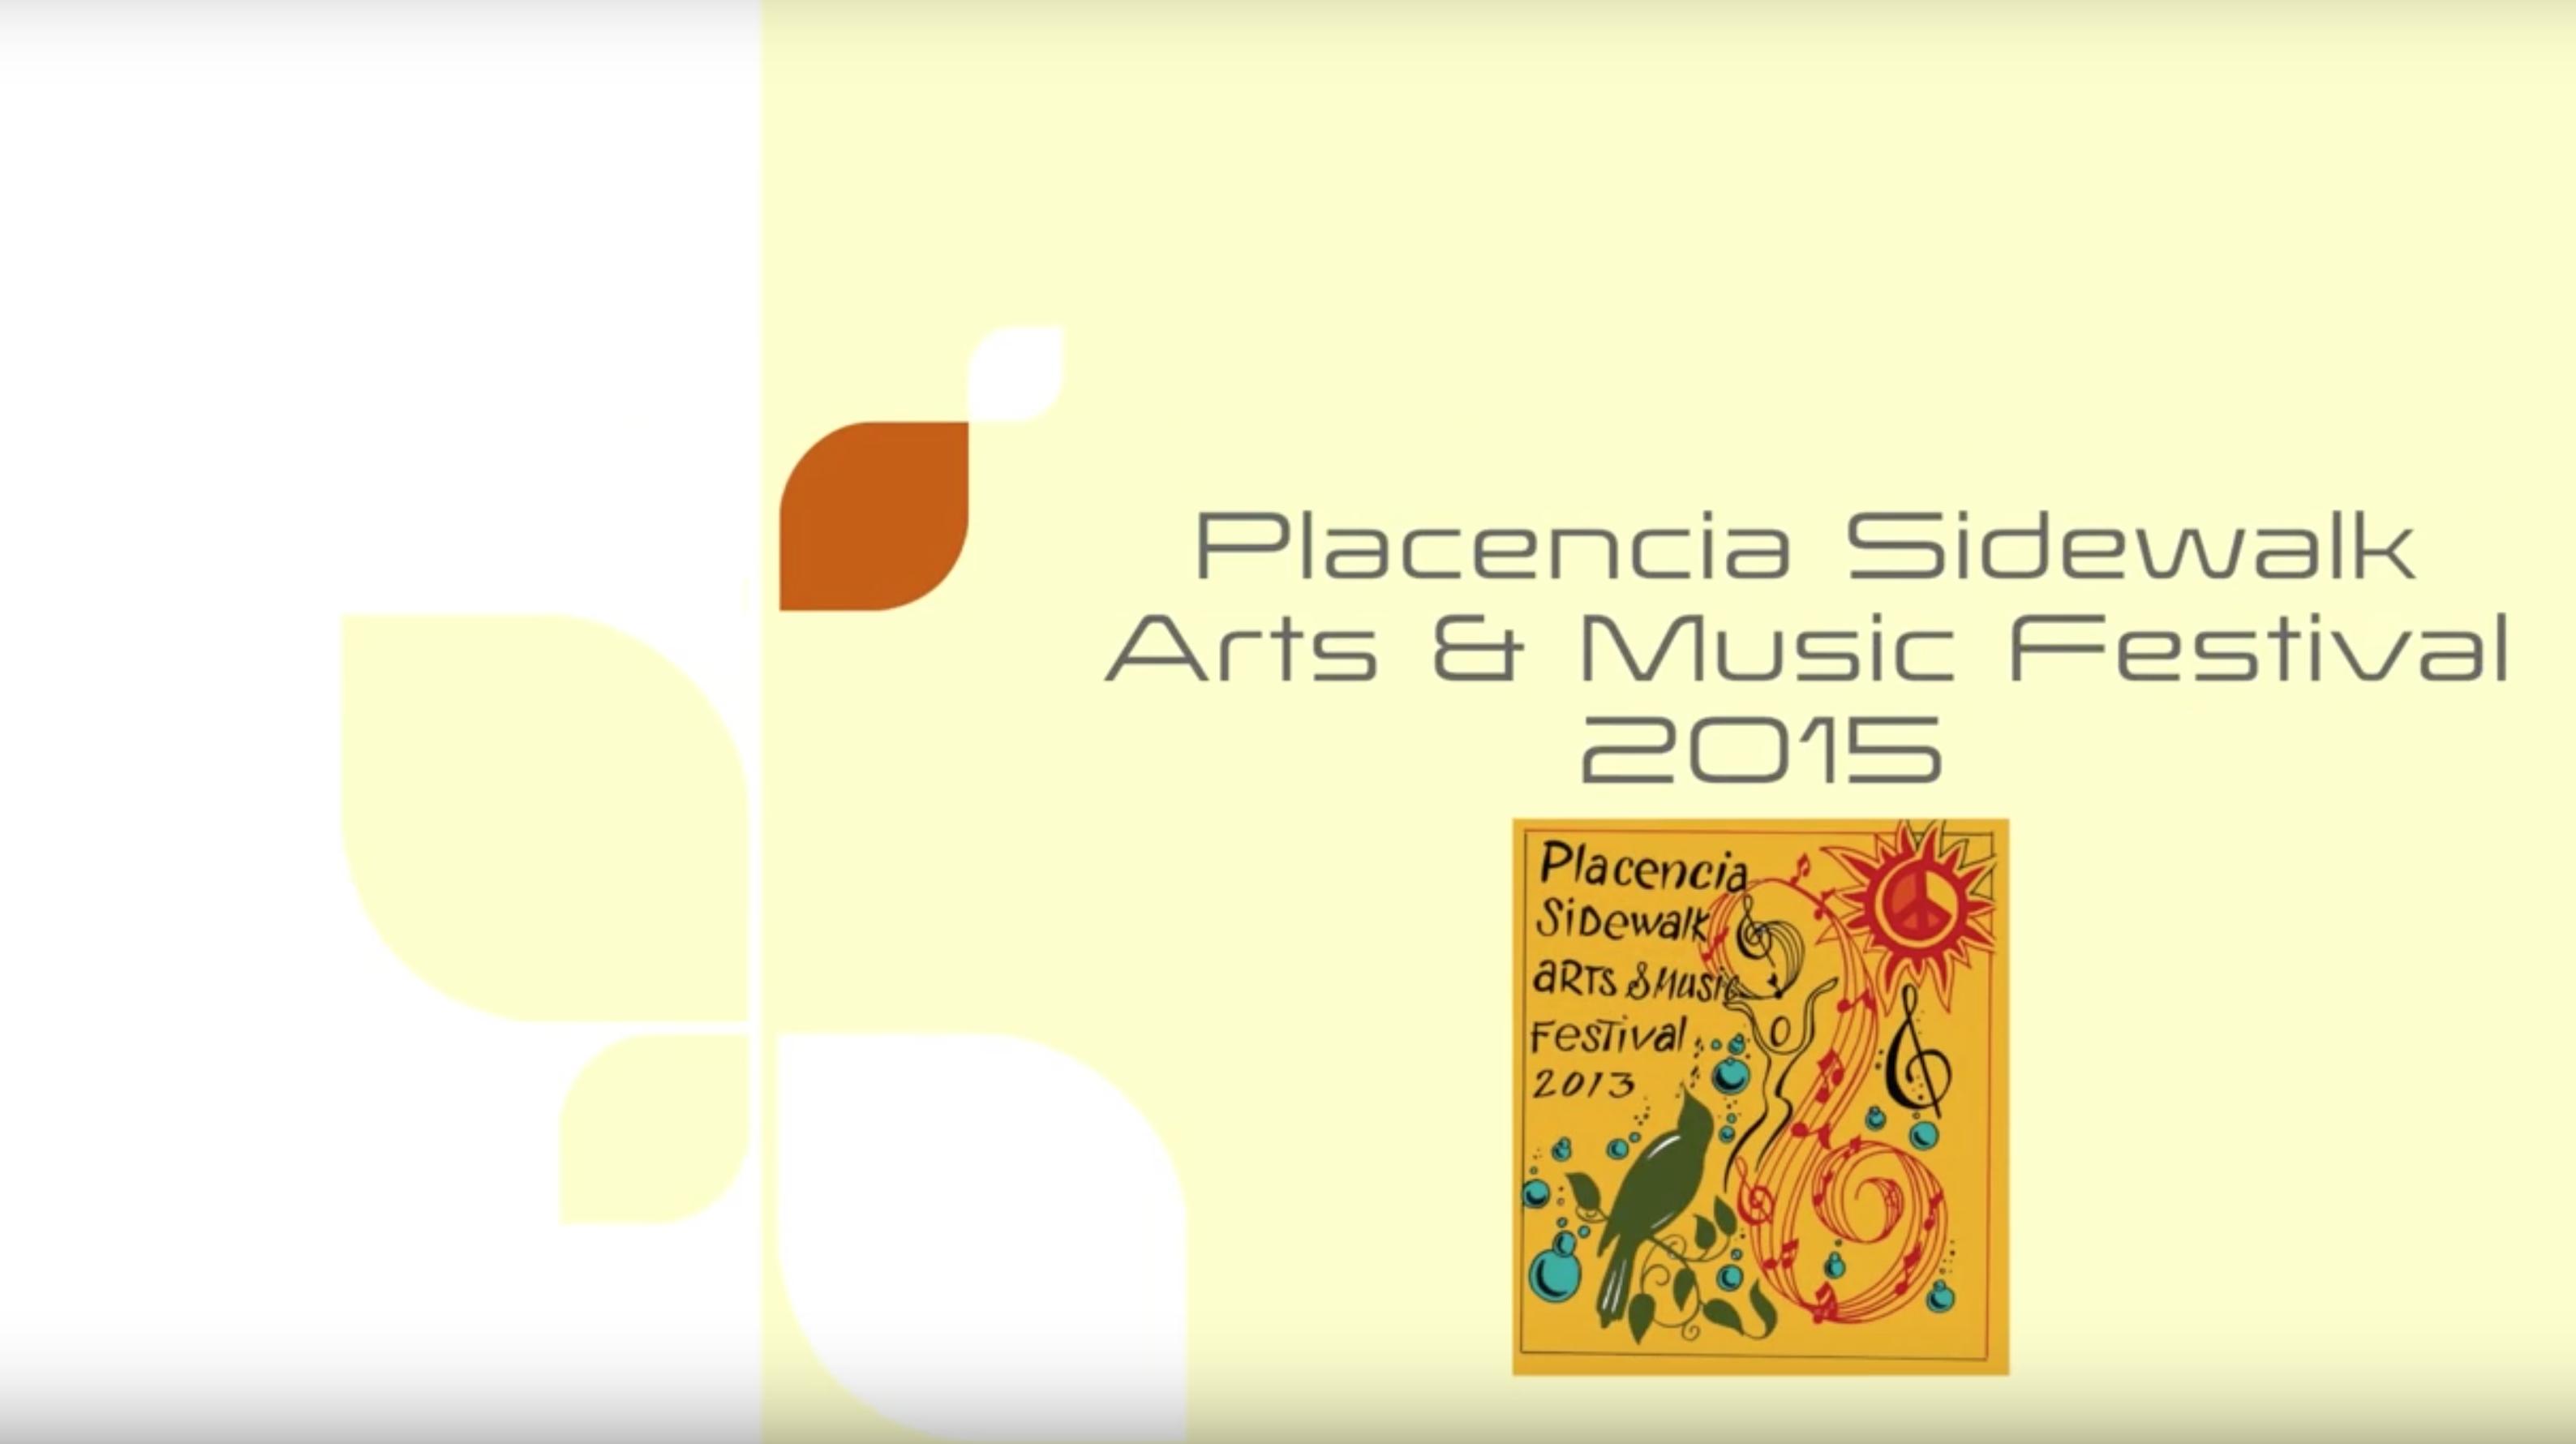 Placencia's Sidewalk Art & Music Festival